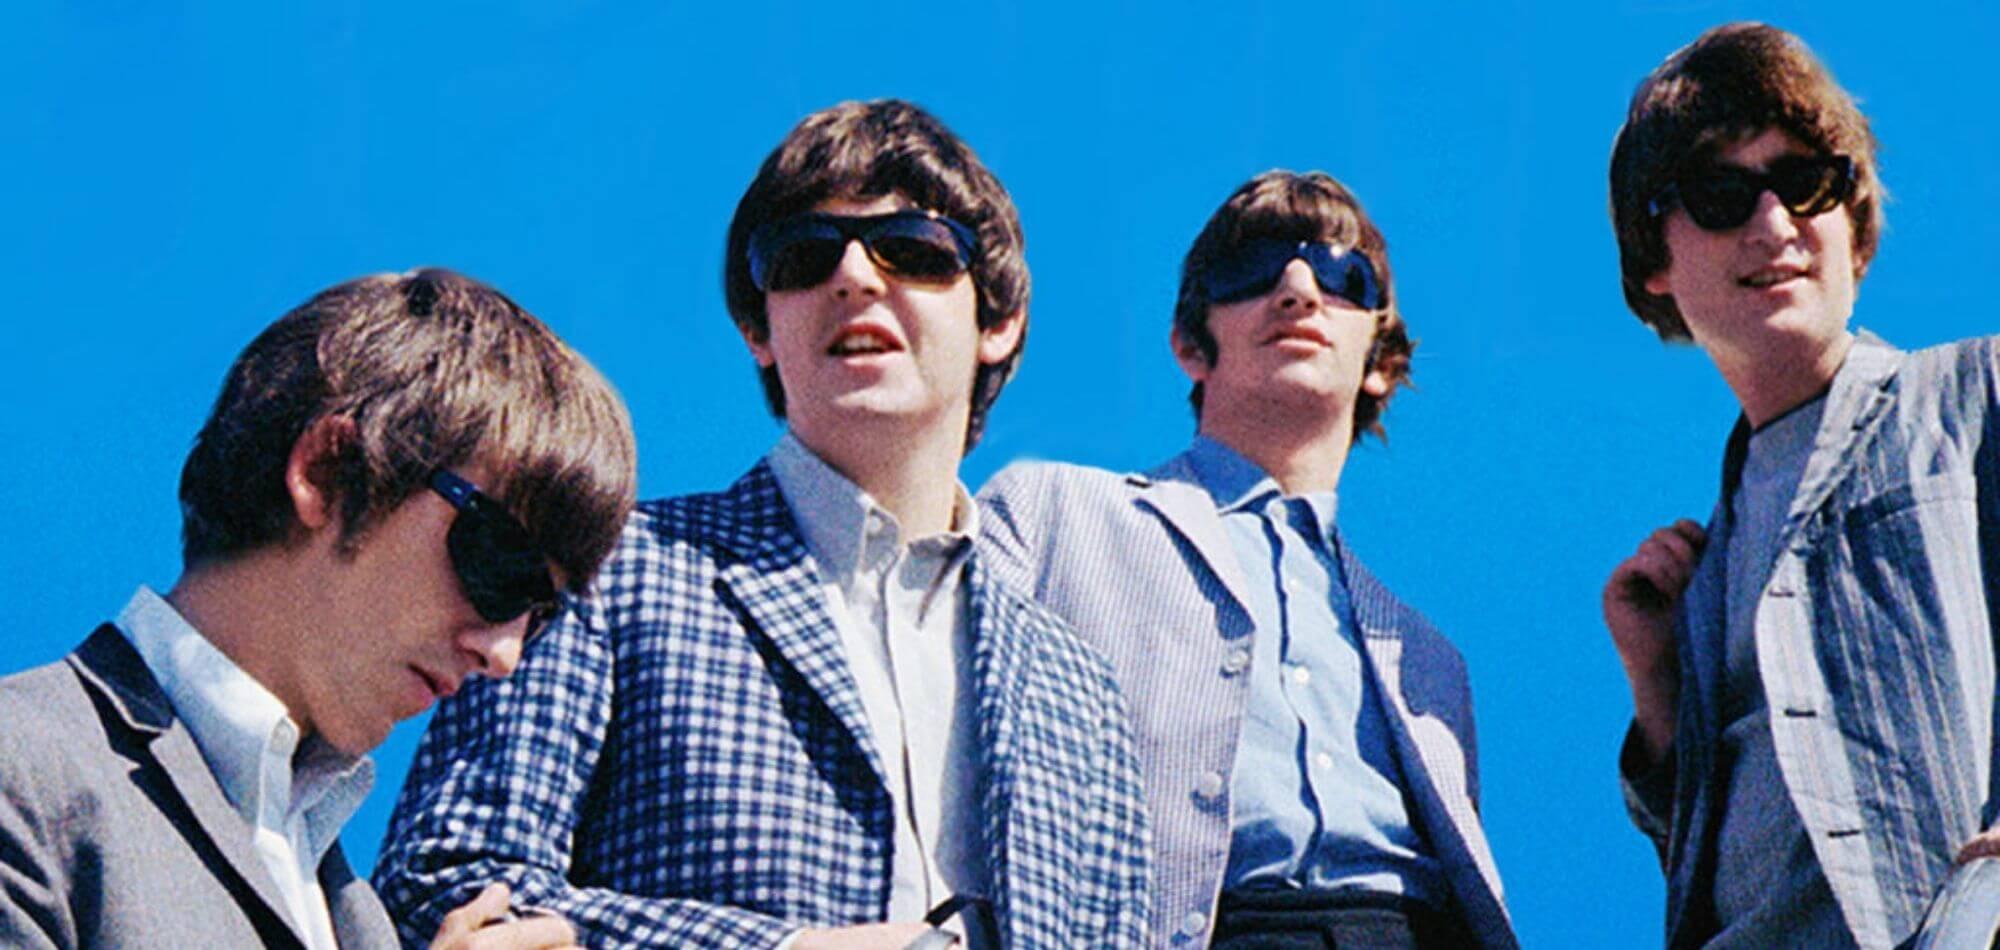 The Beatles: Eight Days a Week (2016)